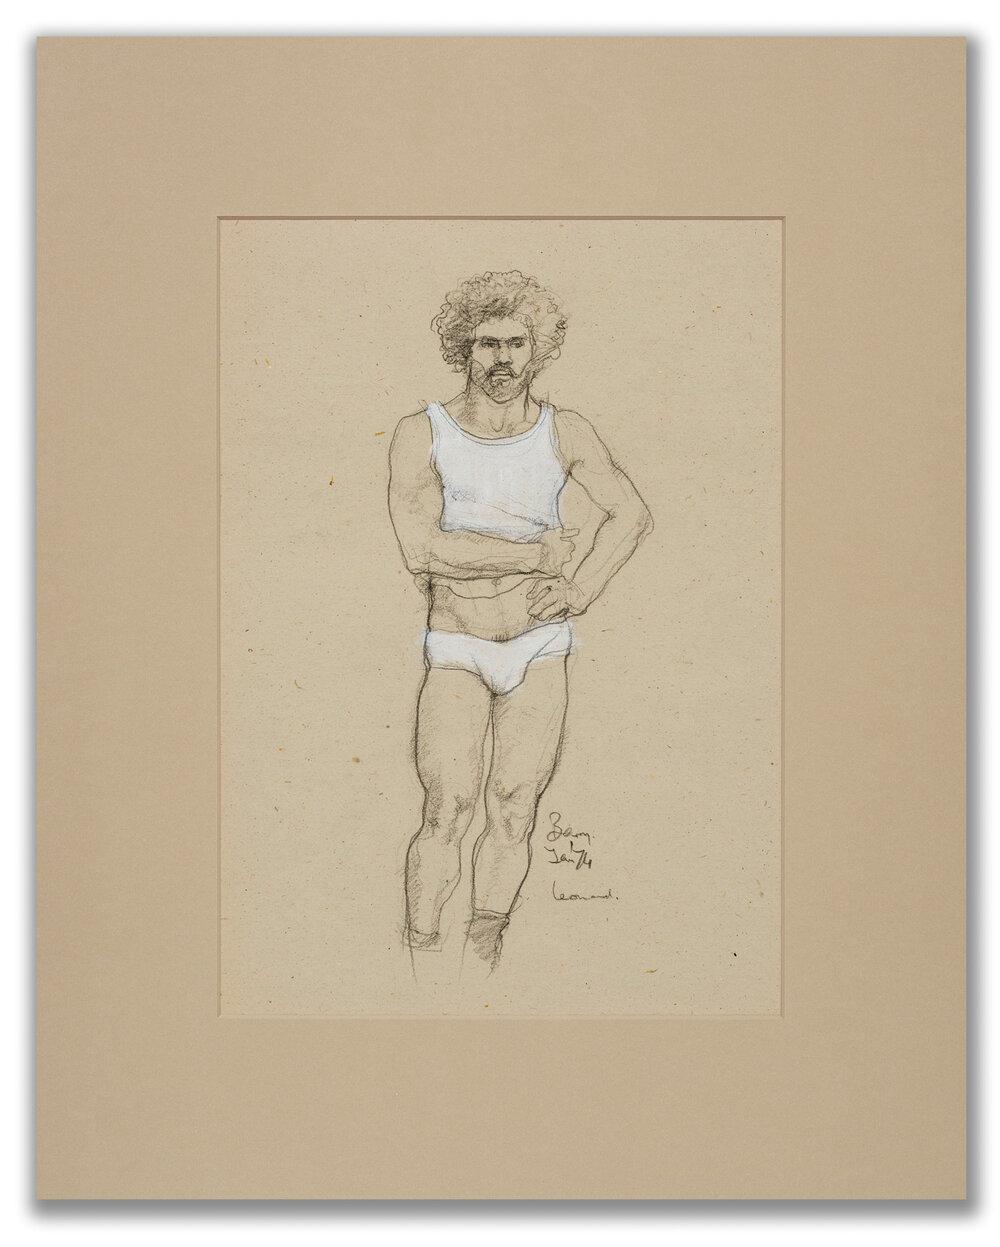 Michael Leonard, (British b.1933), White vest and pants, 1974.